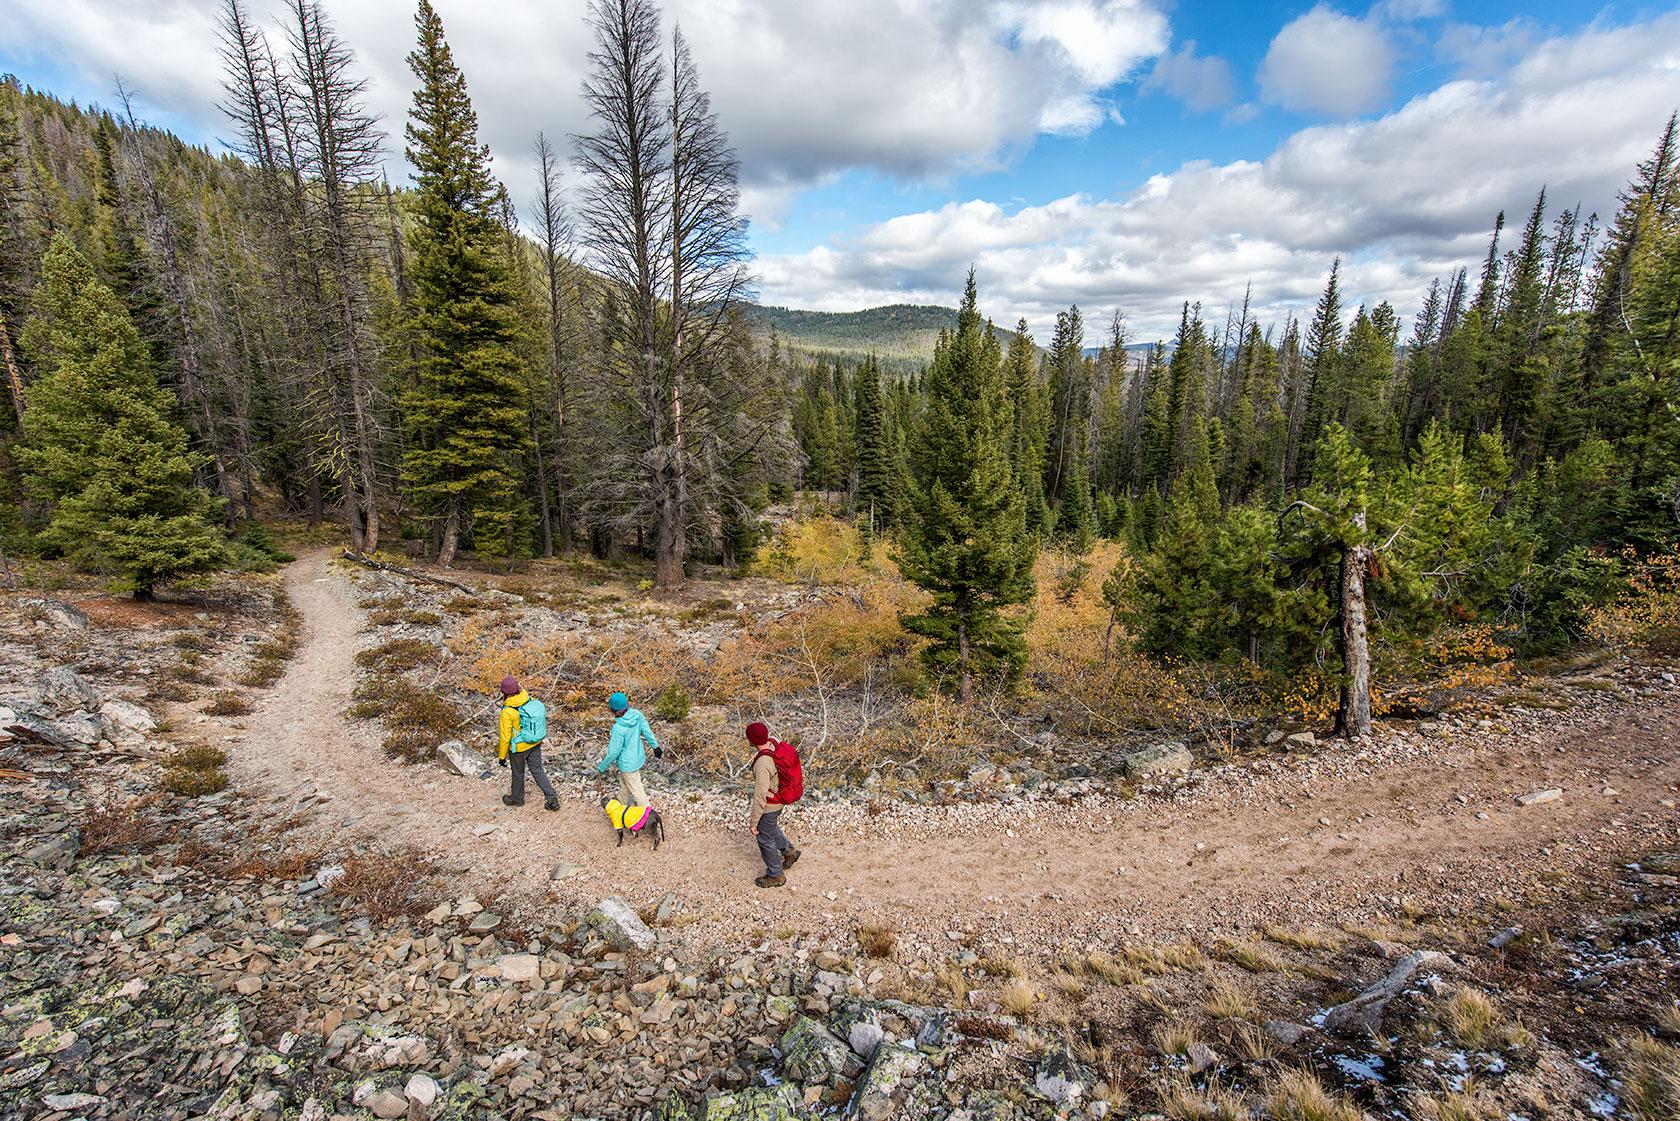 austin-trigg-patagonia-sawtooth-hiking-trail-advenure-wilderness-forest-idaho-outside-lifestyle-clouds.jpg